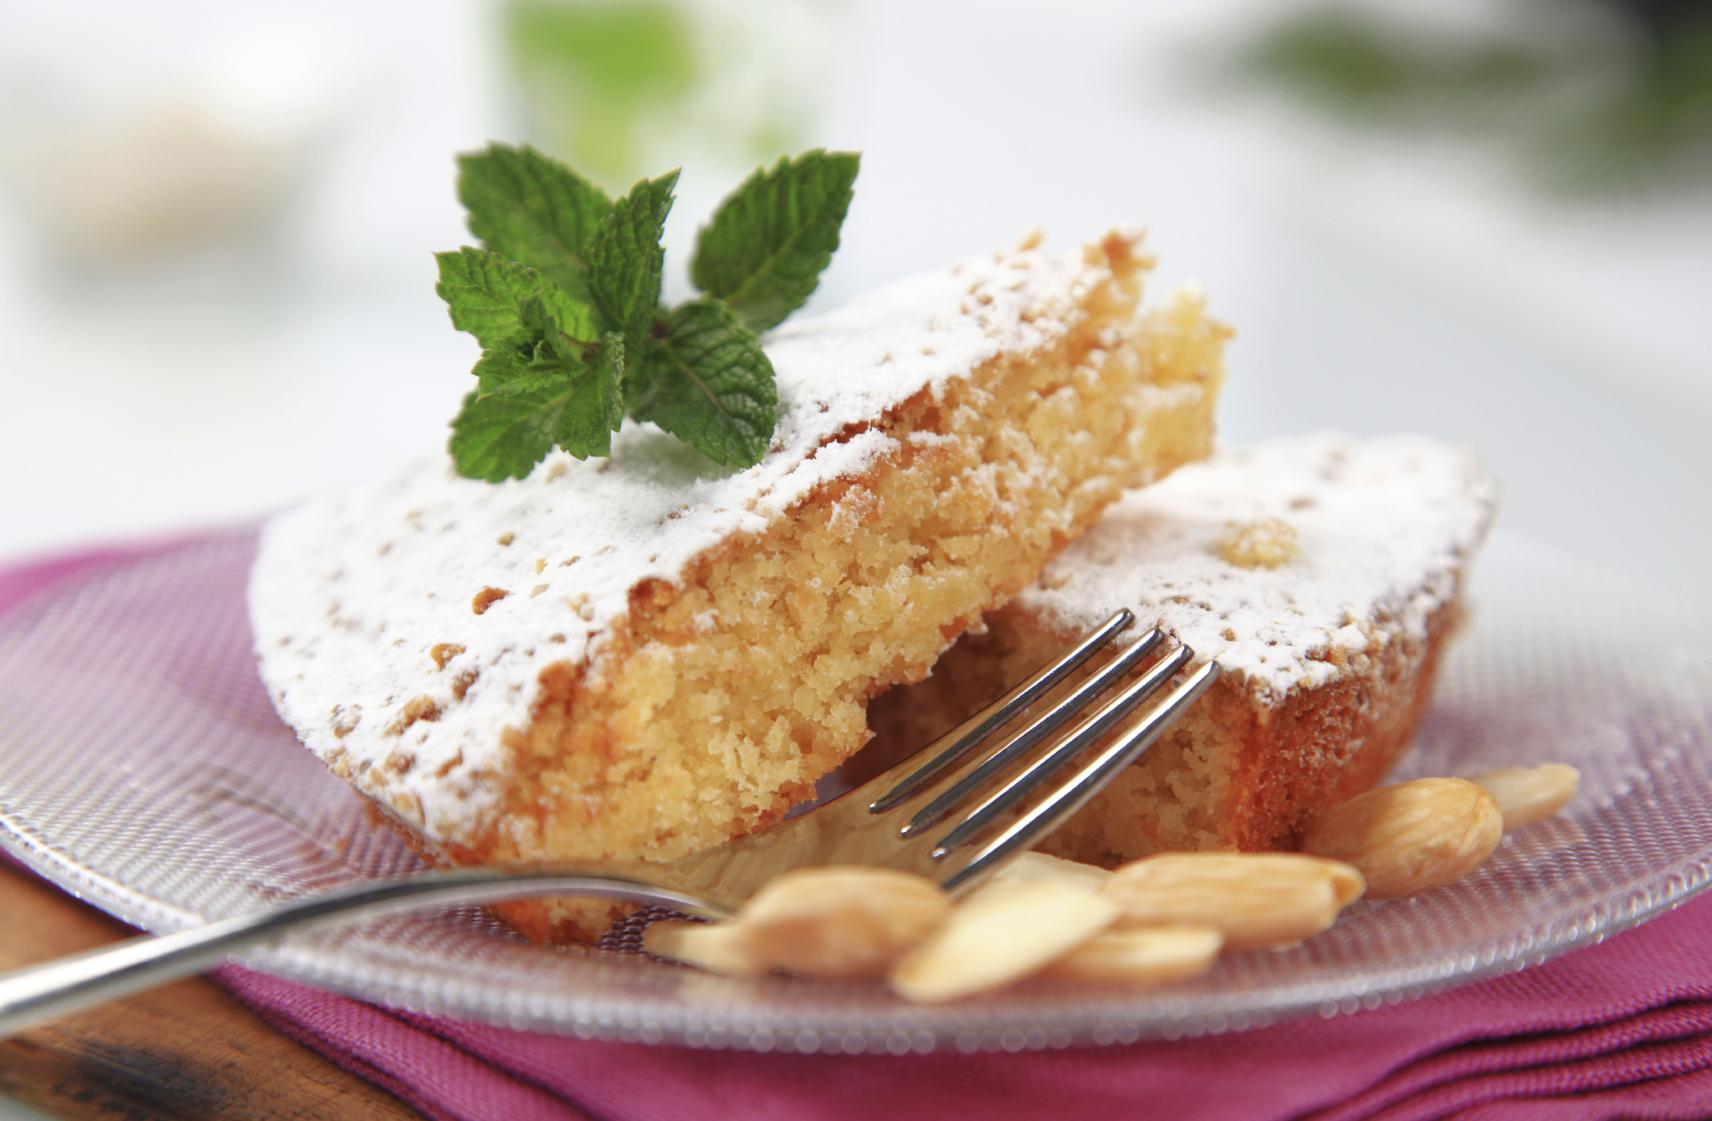 Tarta de Santiago con almendra molida